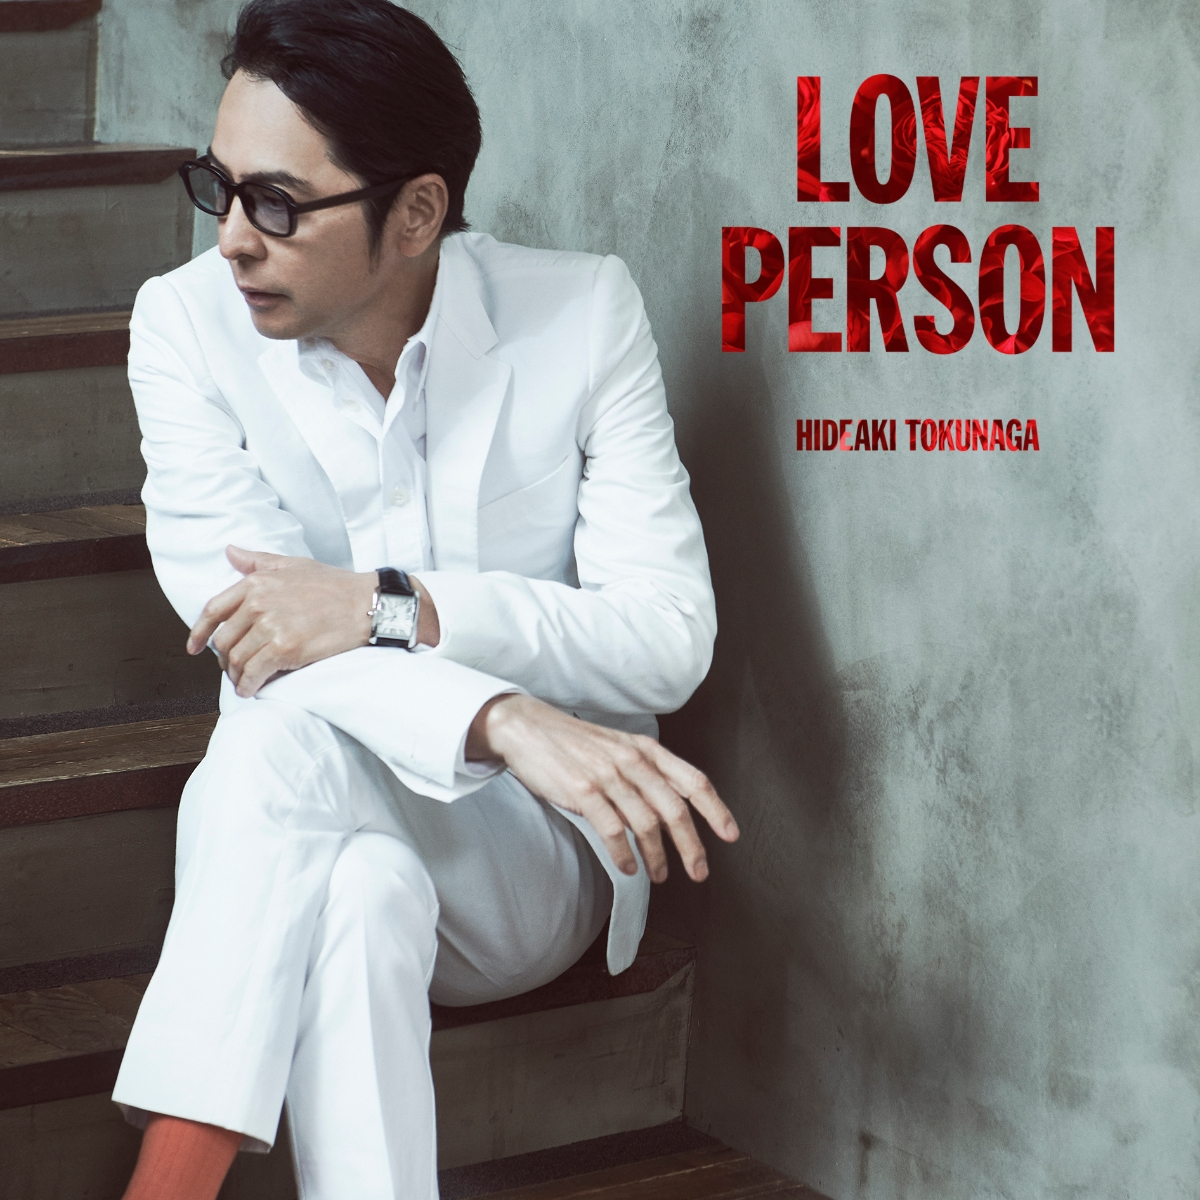 Love Person - Hideaki Tokunaga - Musik - UNIVERSAL - 4988031429914 - June 4, 2021